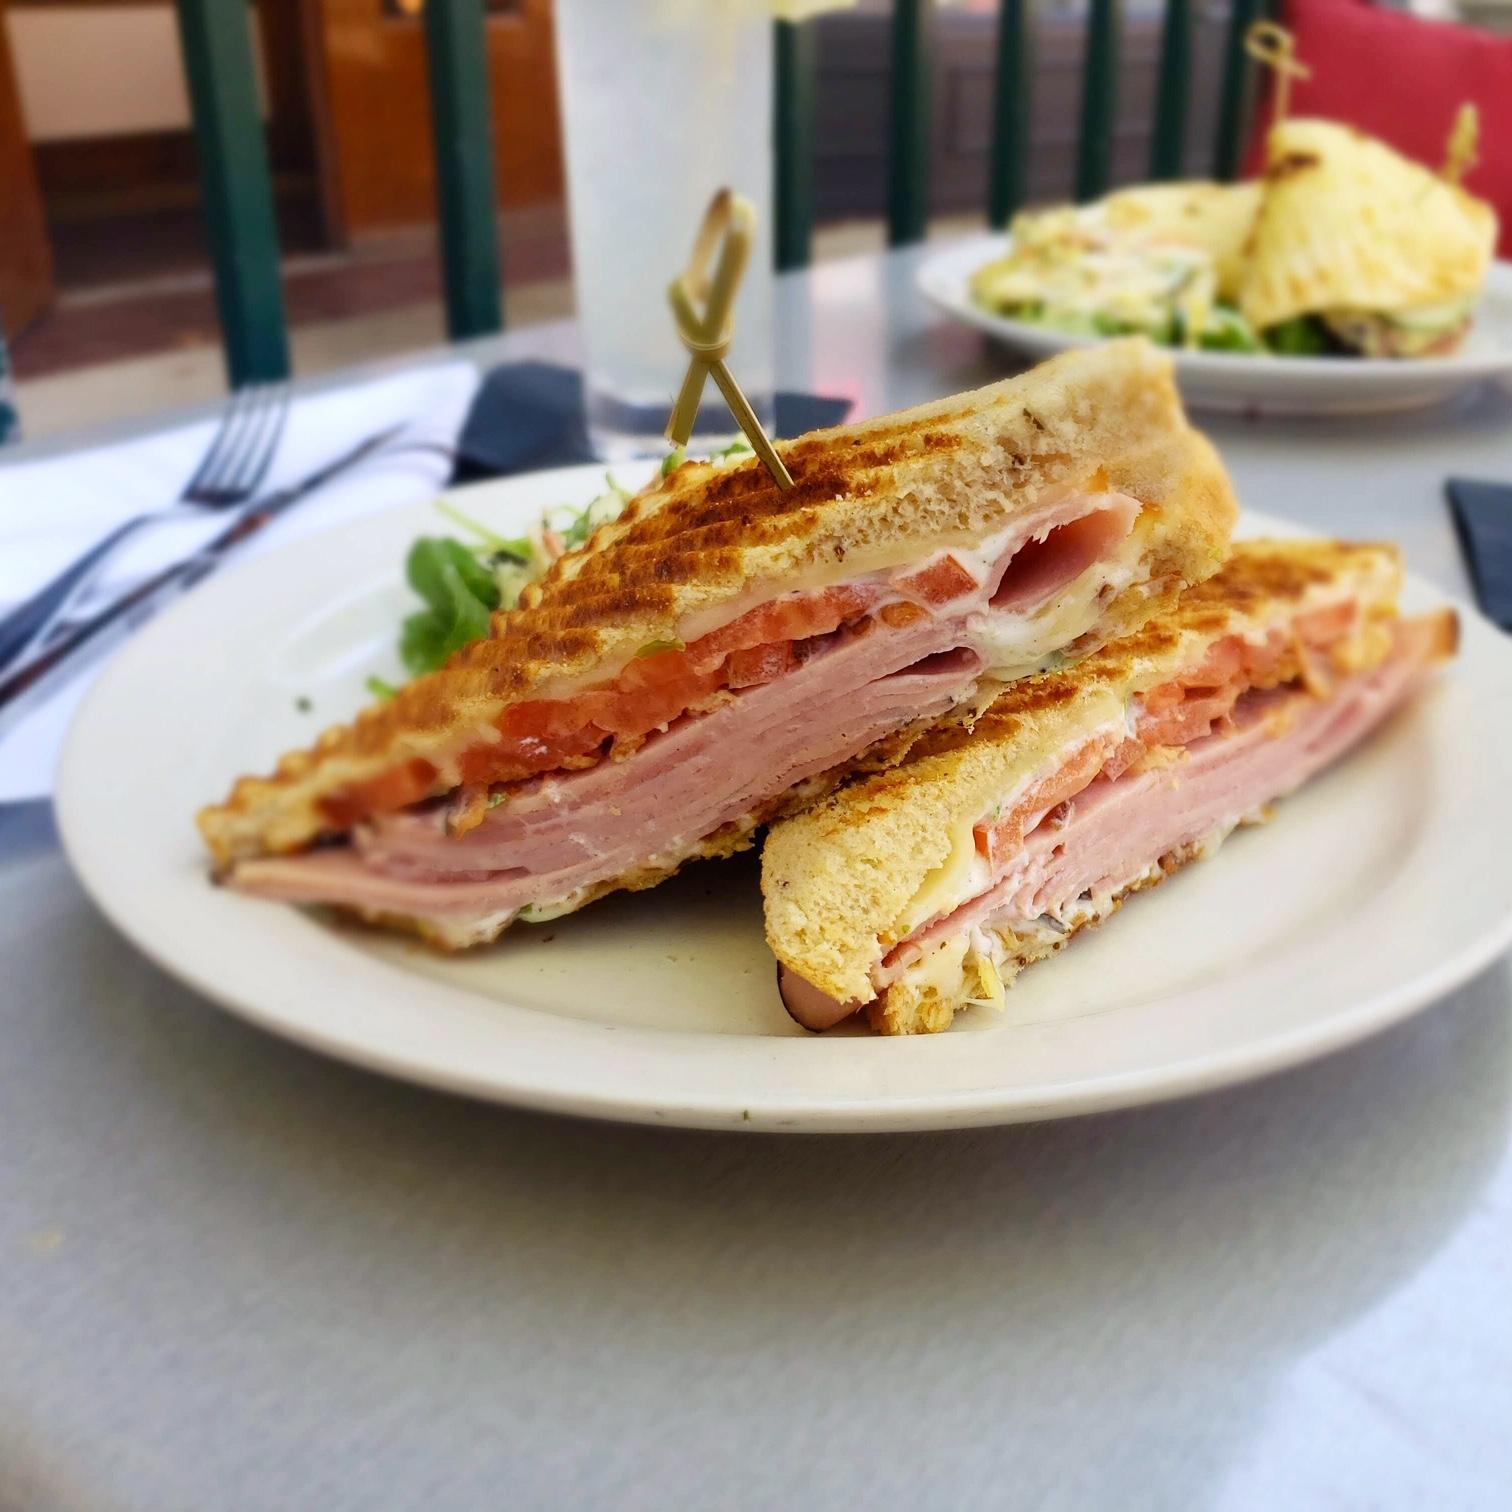 panini-lunch-holland-waverly-stone